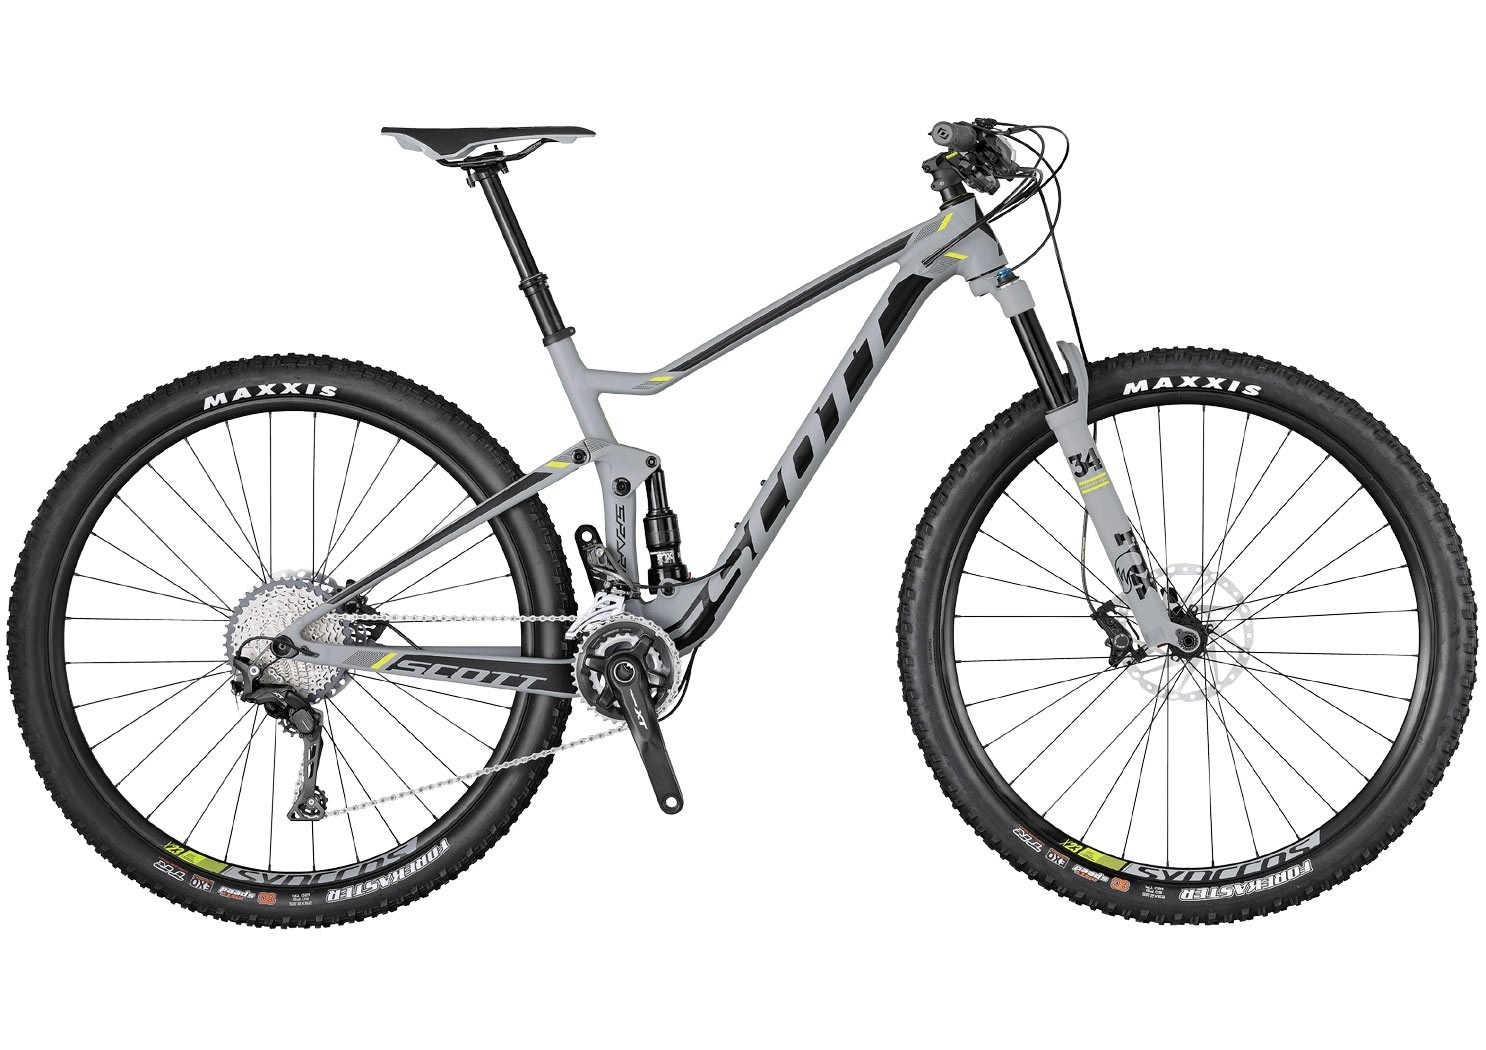 Scott Genius 940 Mountain Bike 2018 - bikesale.com